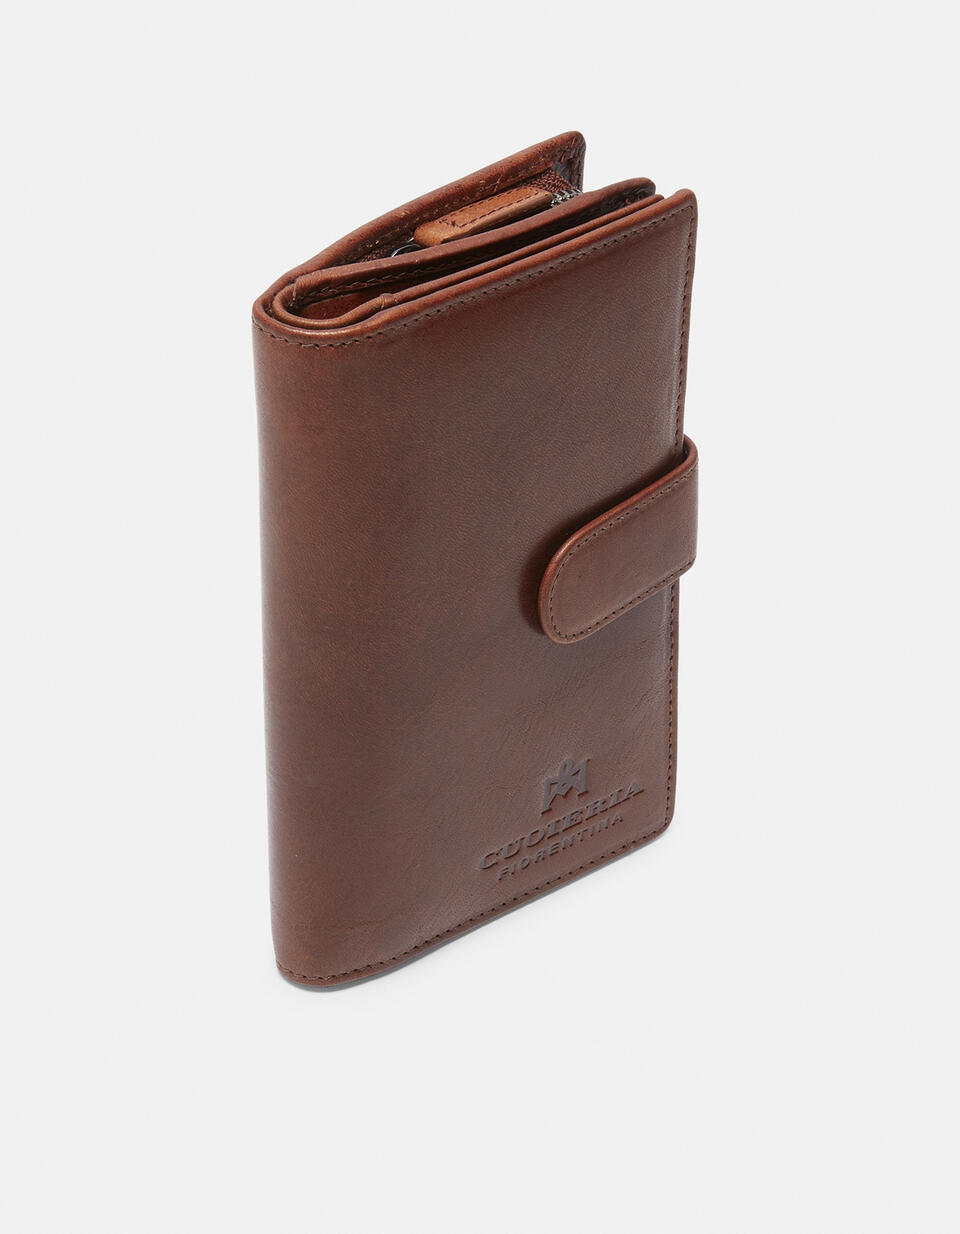 Warm and Color wallet with coin purse MARRONE Cuoieria Fiorentina